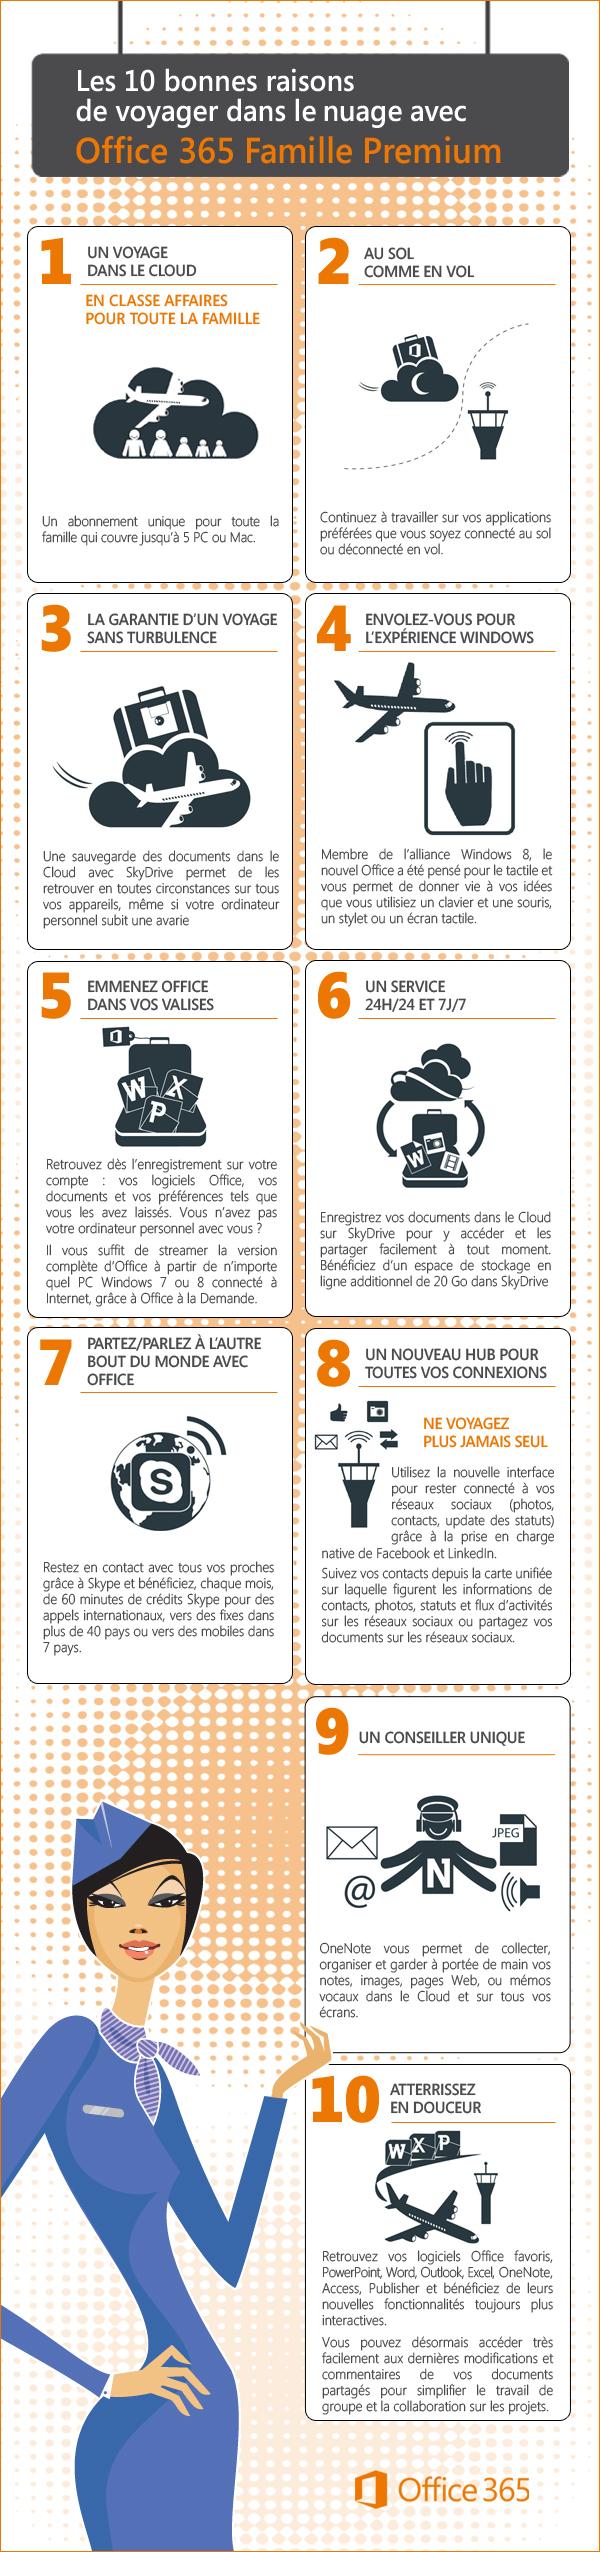 Infographie Microsoft Office 365 © Microsoft